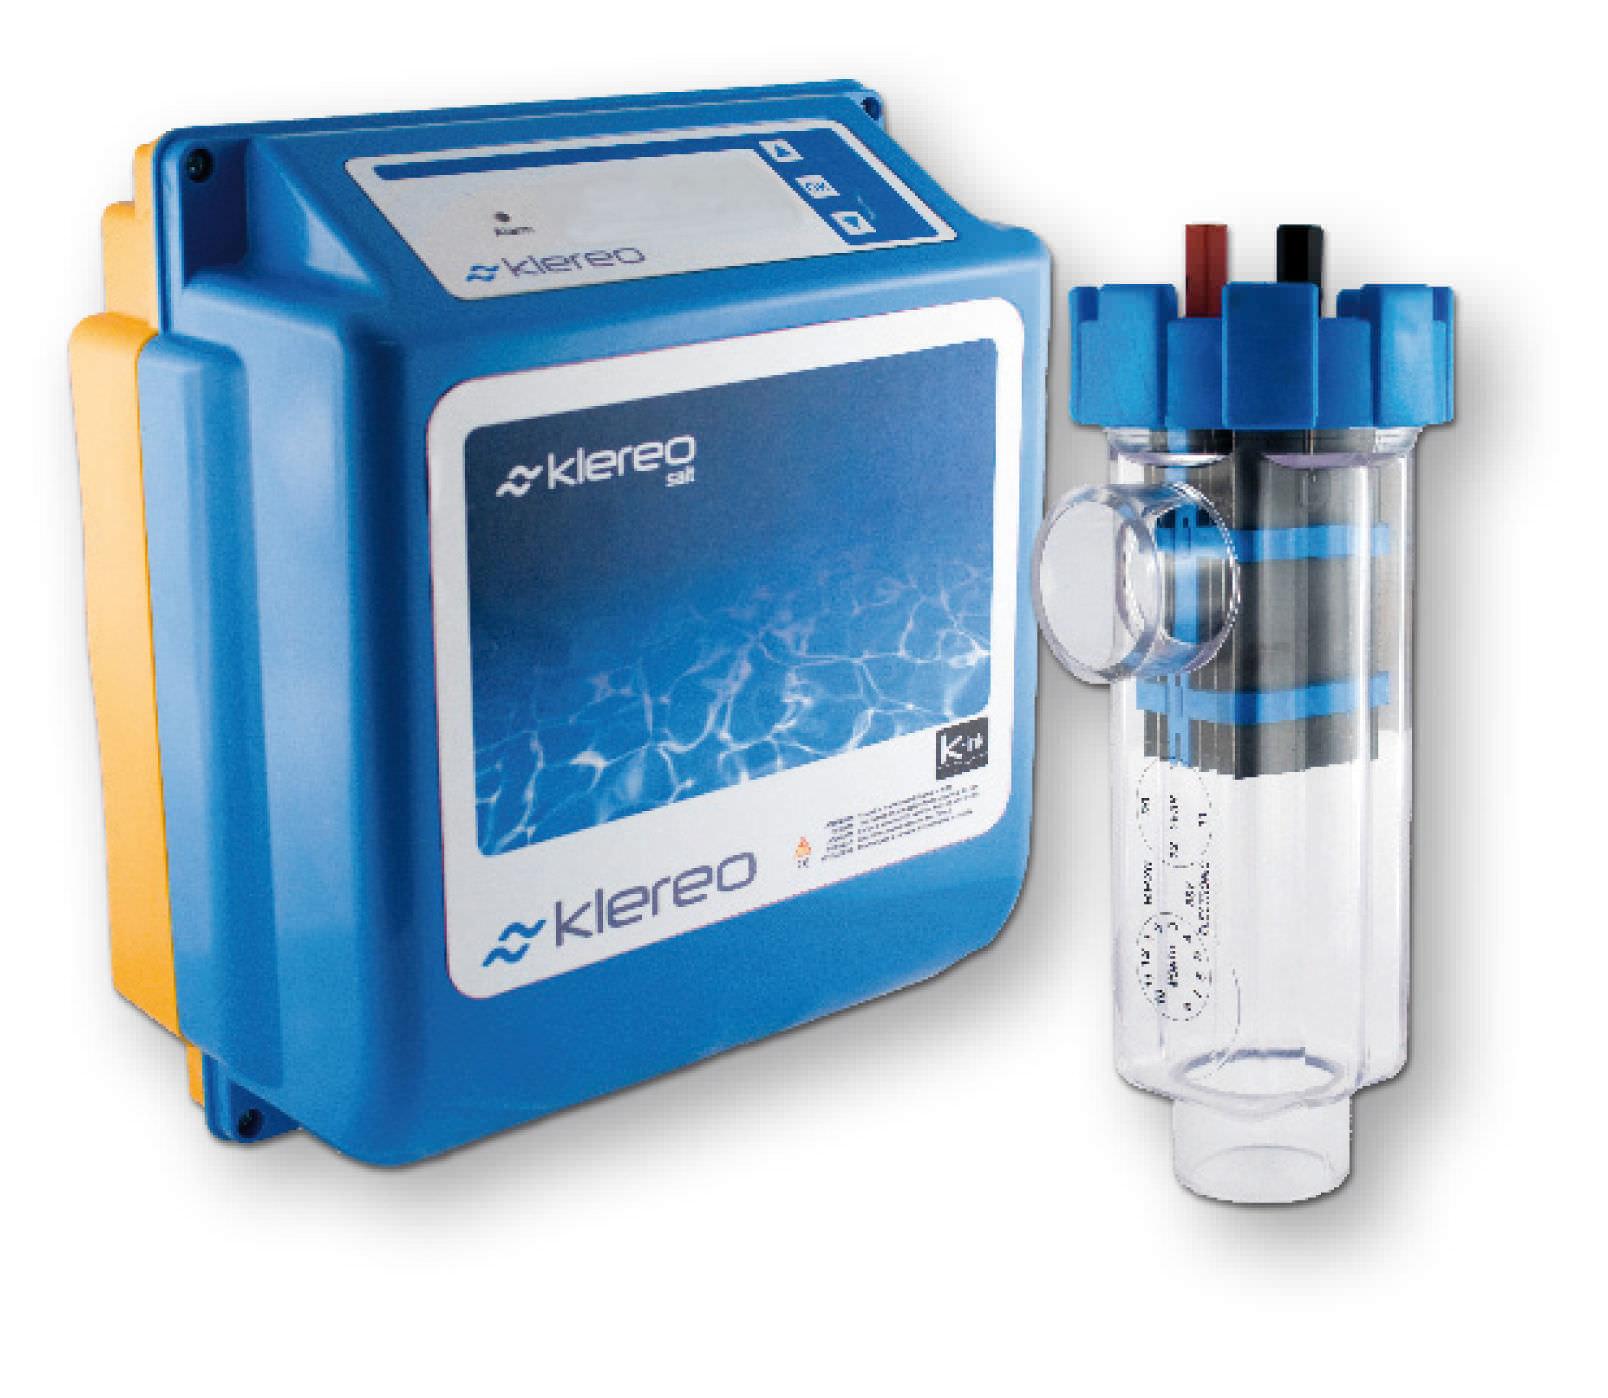 electrolyseur klereo